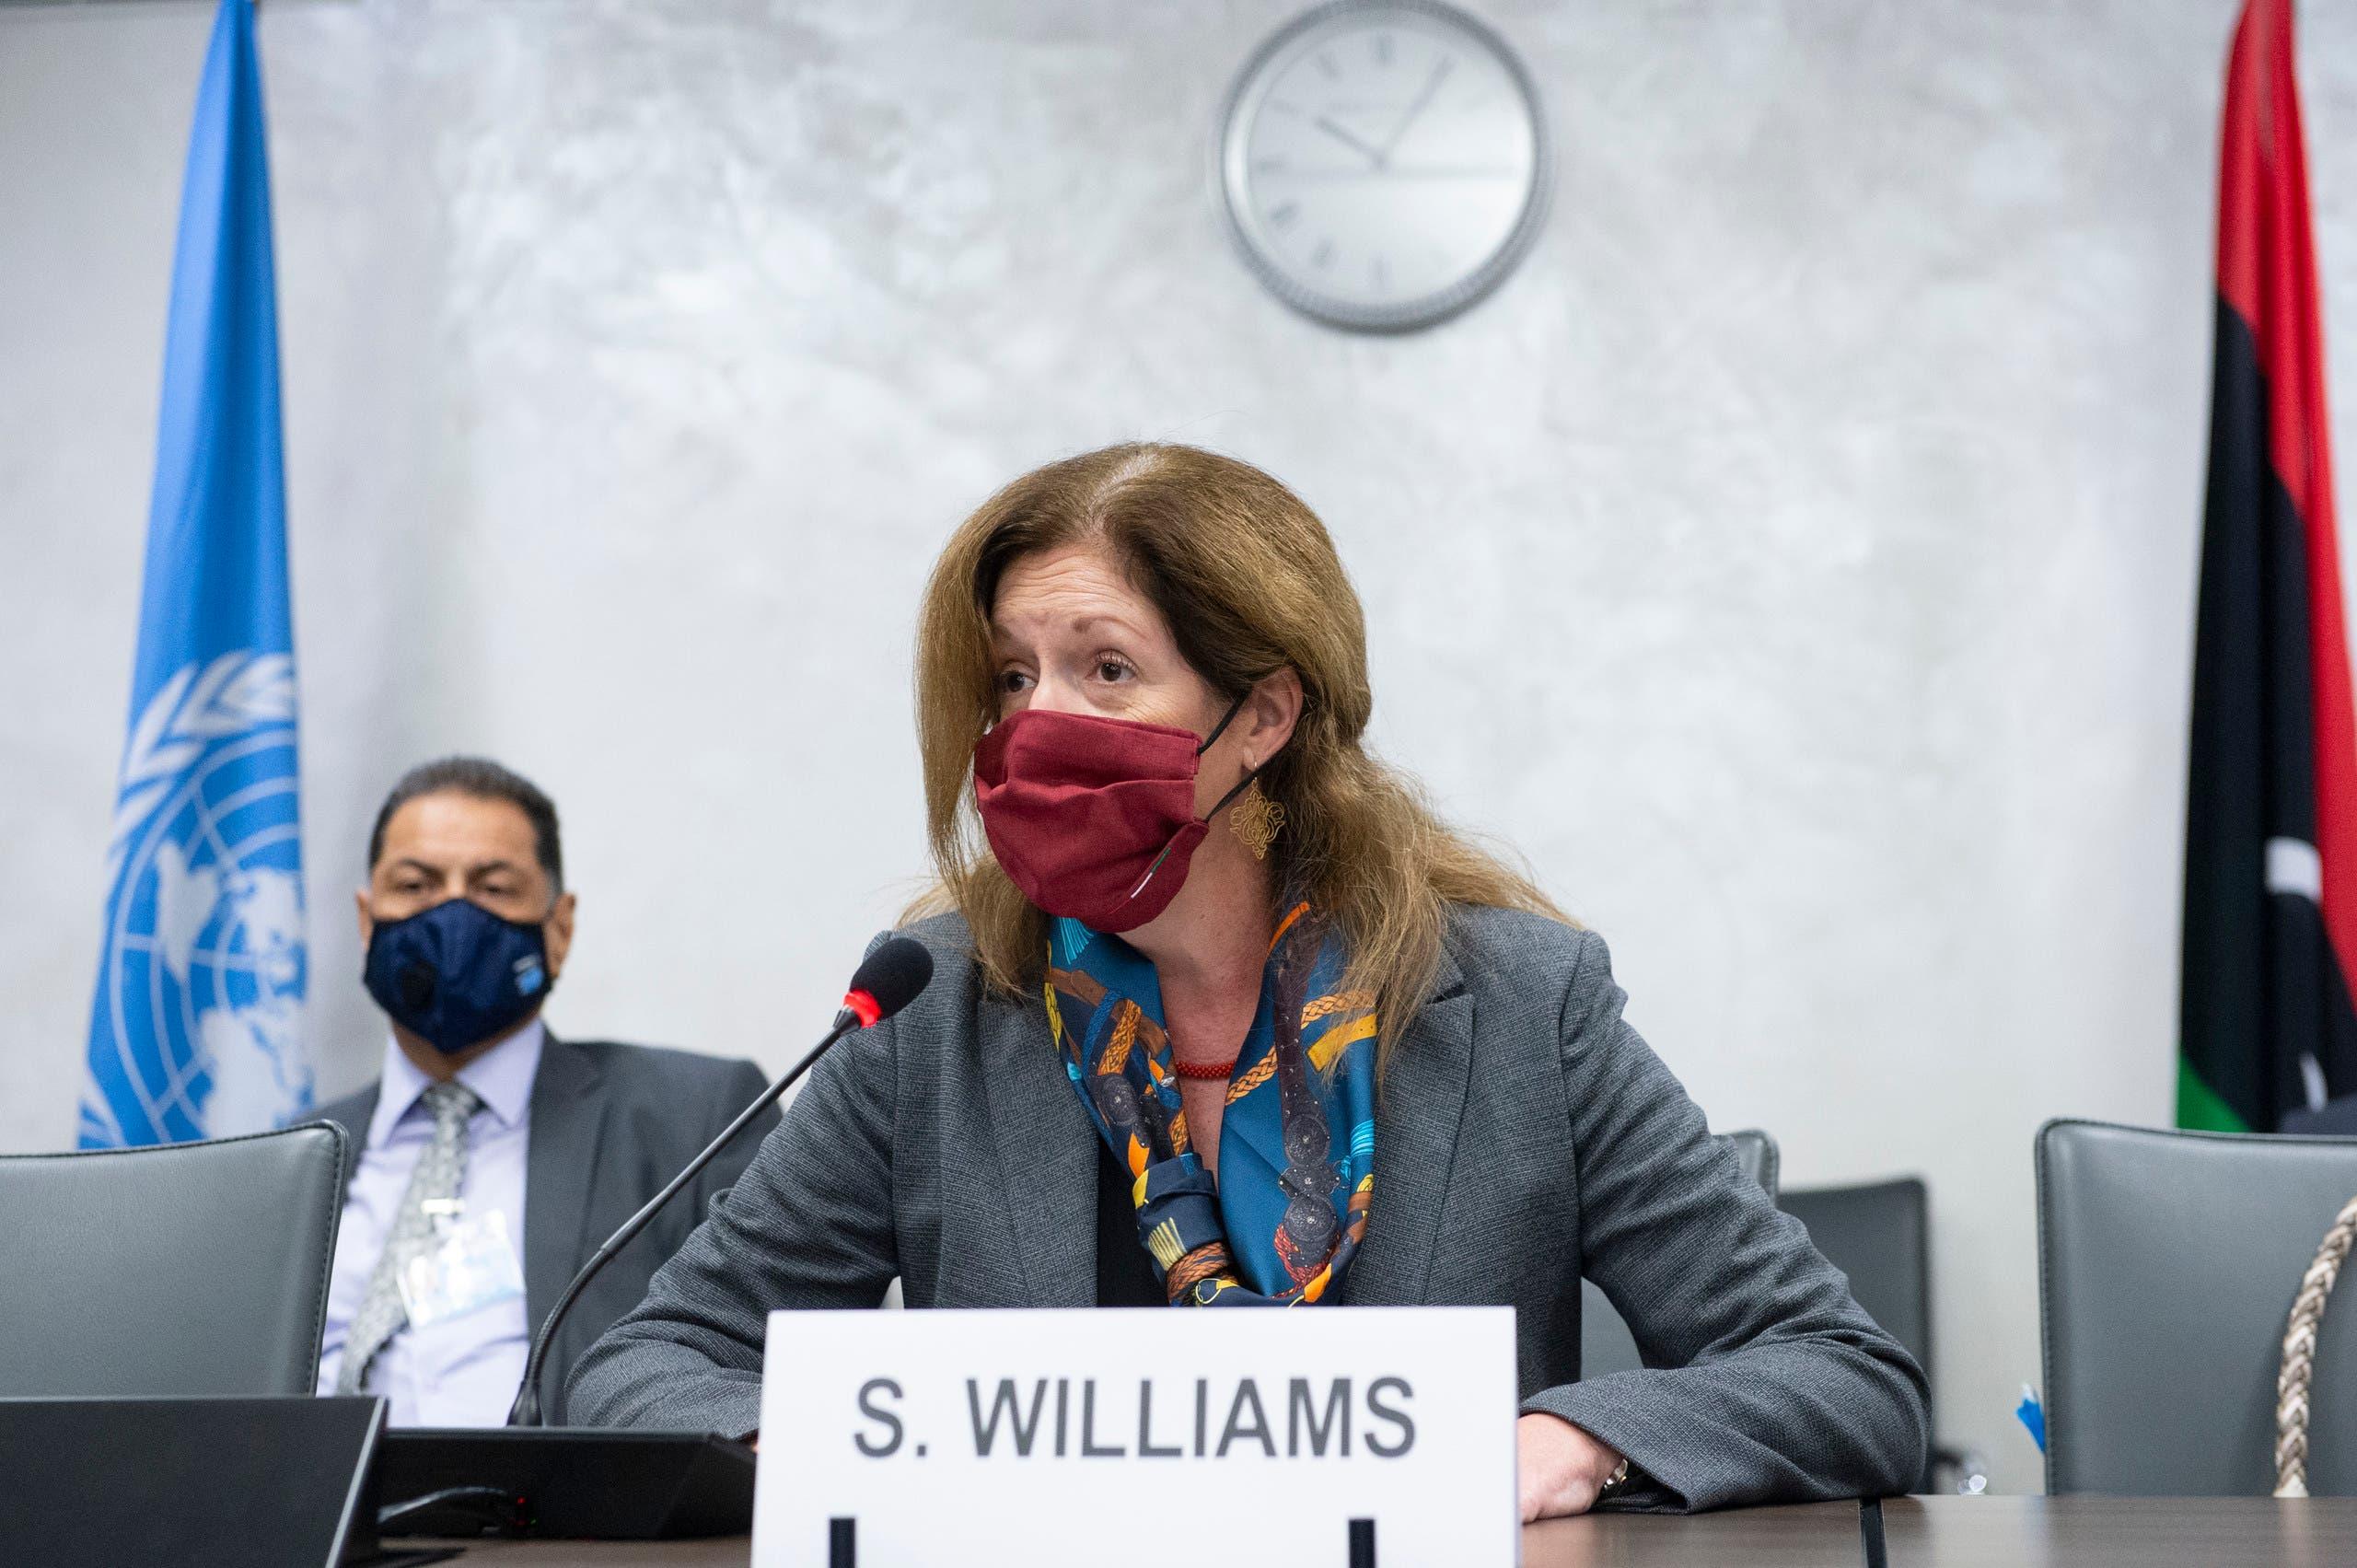 ستيفاني ويليامز